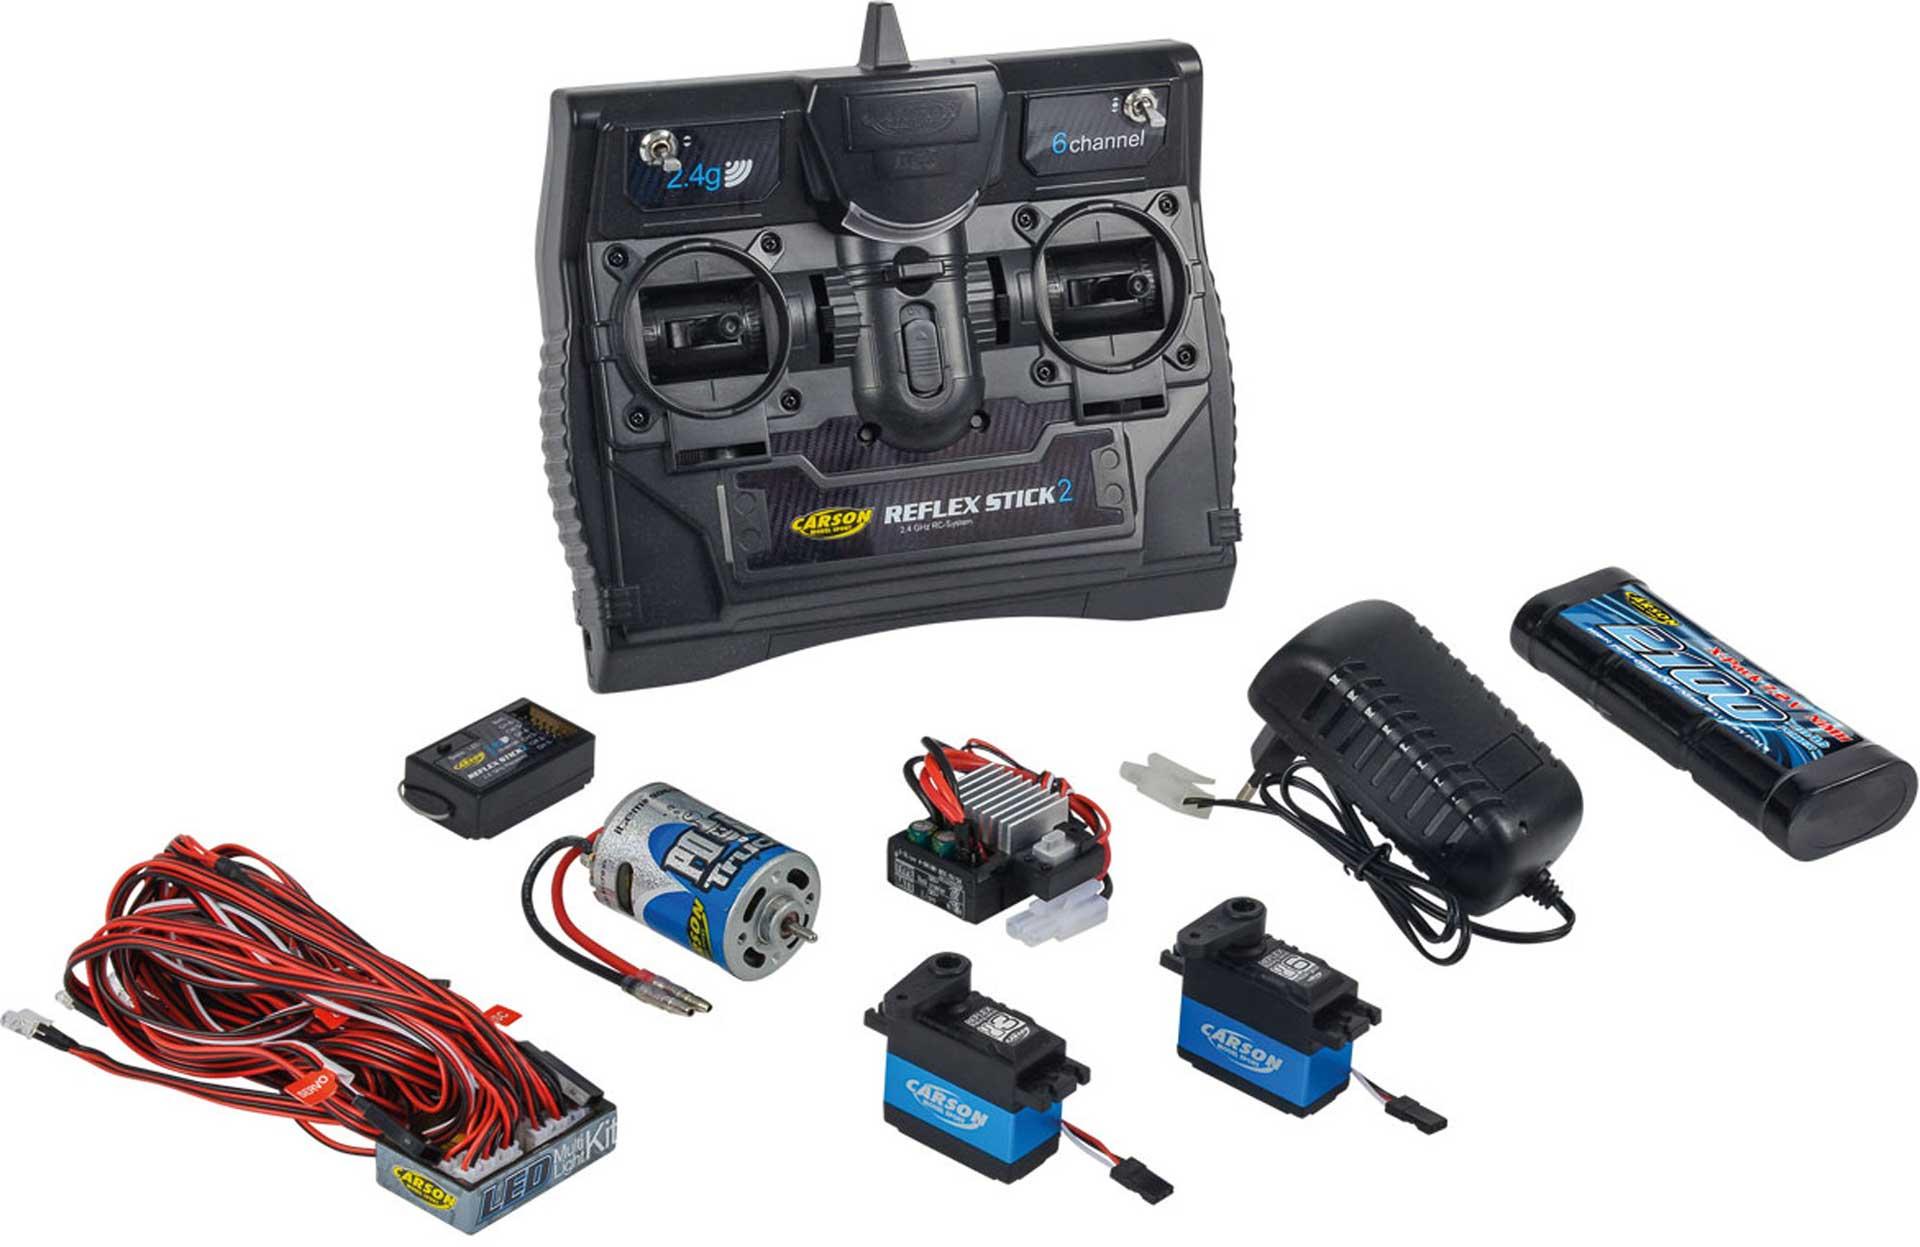 CARSON REFLEX STICK TRUCK-SET 2.4G 6 KANAL 2,4Ghz FERNSTEUERUNG